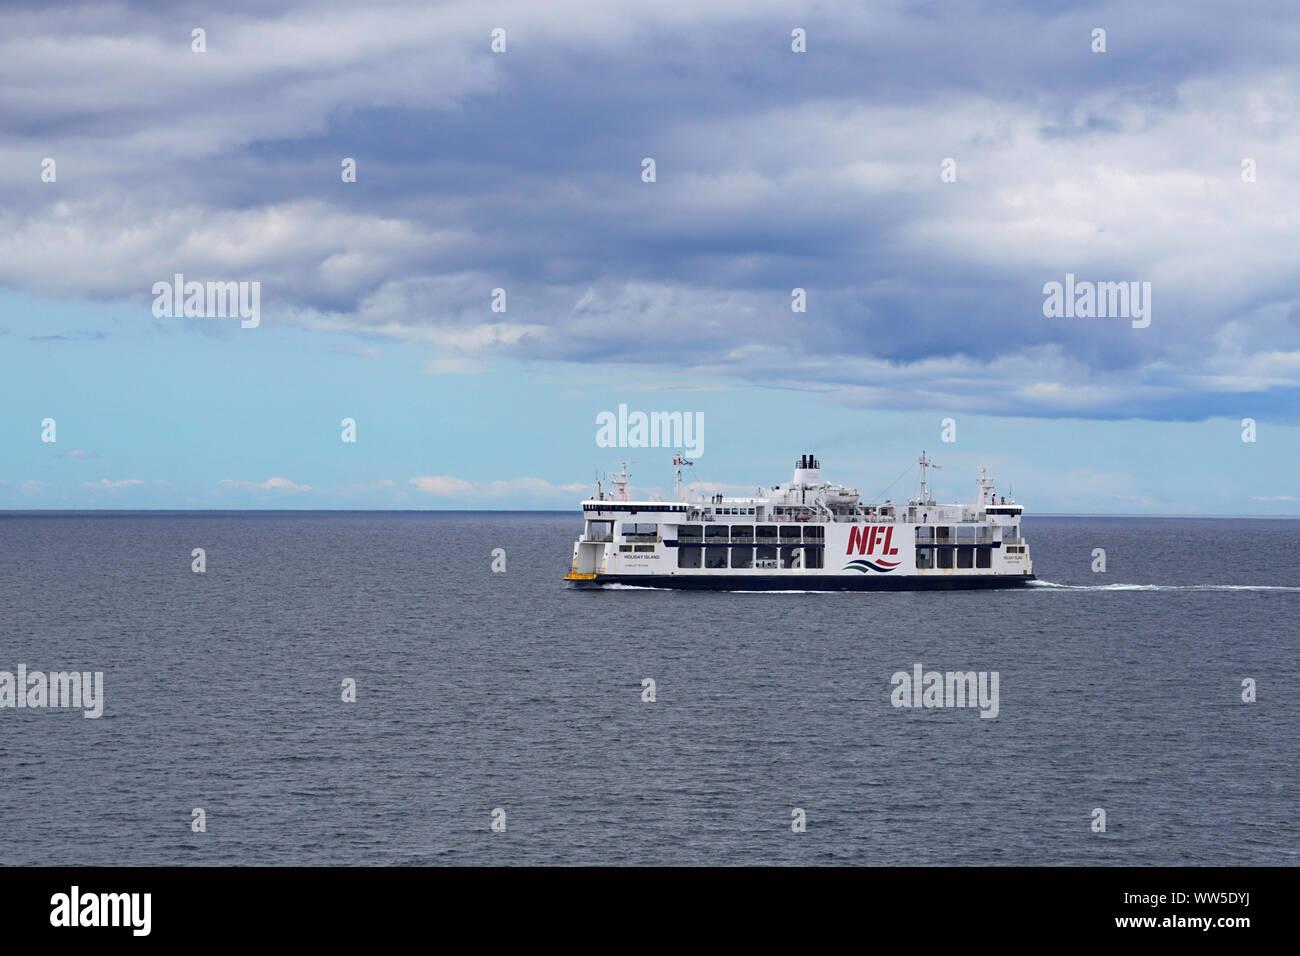 Northumberland Ferry Ltd (NFL) crossing from Nova Scotia to Prince Edward Island, Canada Stock Photo